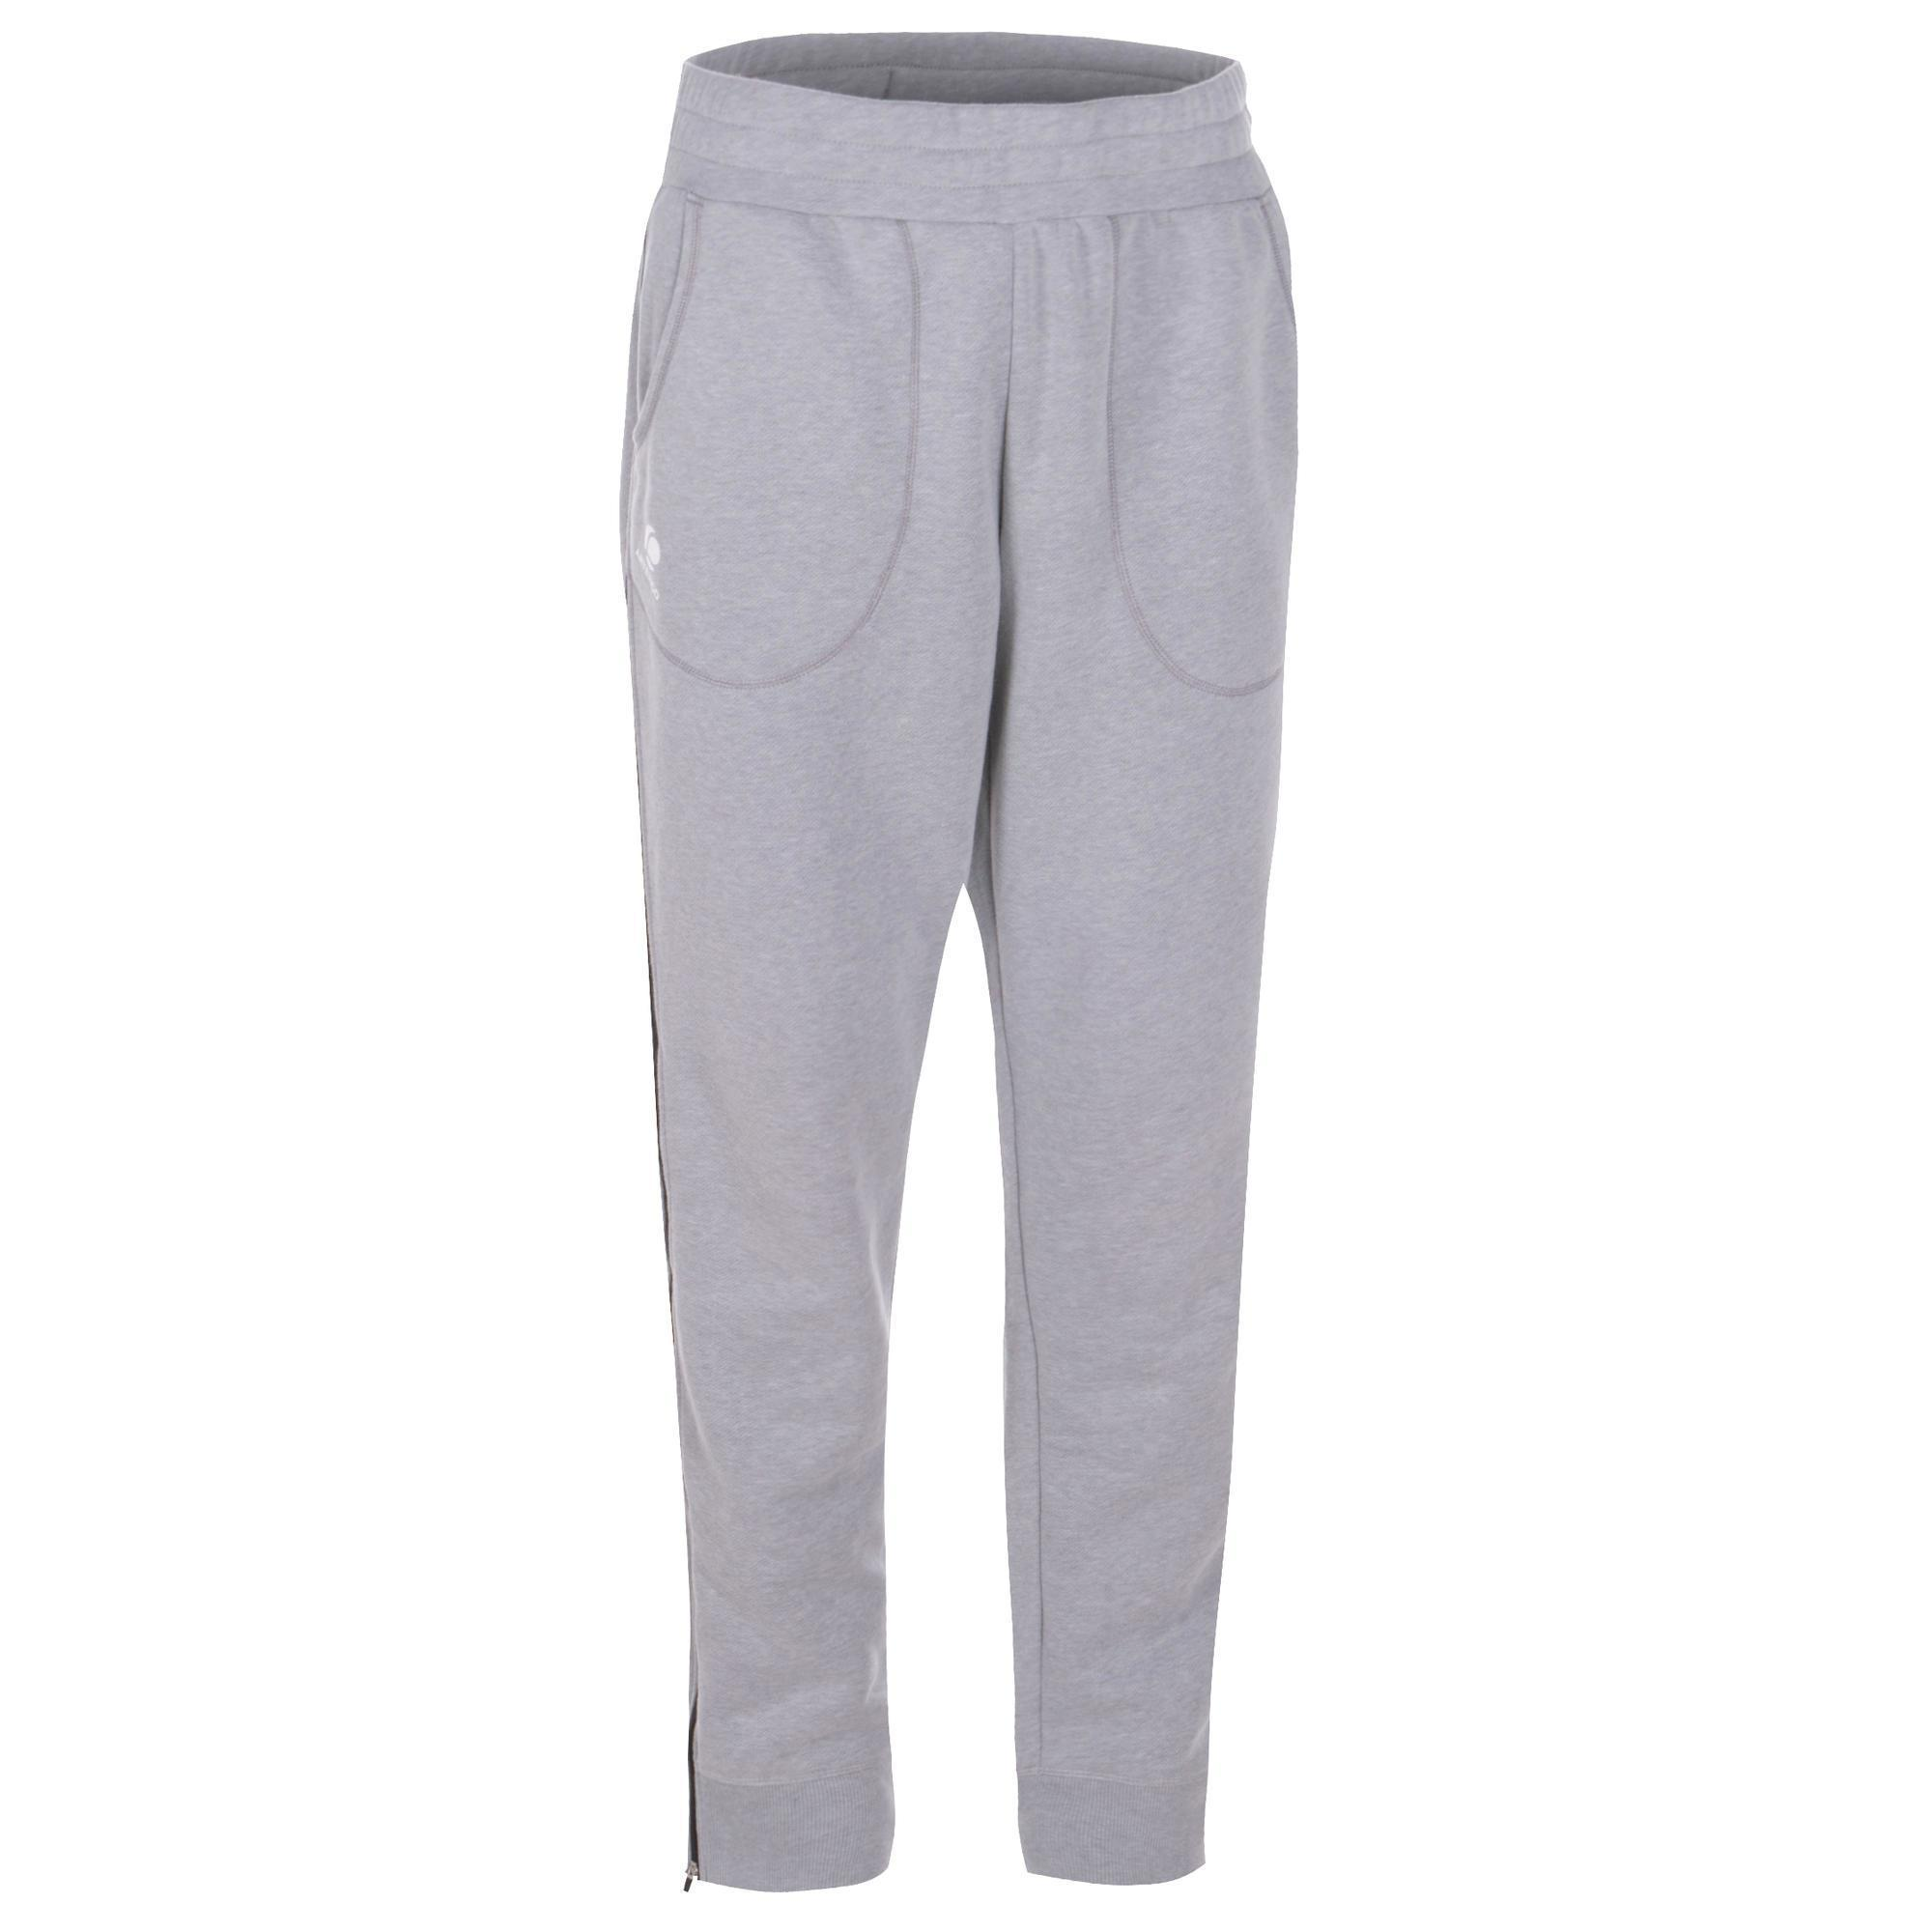 Pantaloni Soft 500 Chiaro Uomo Grigio xoCreBd